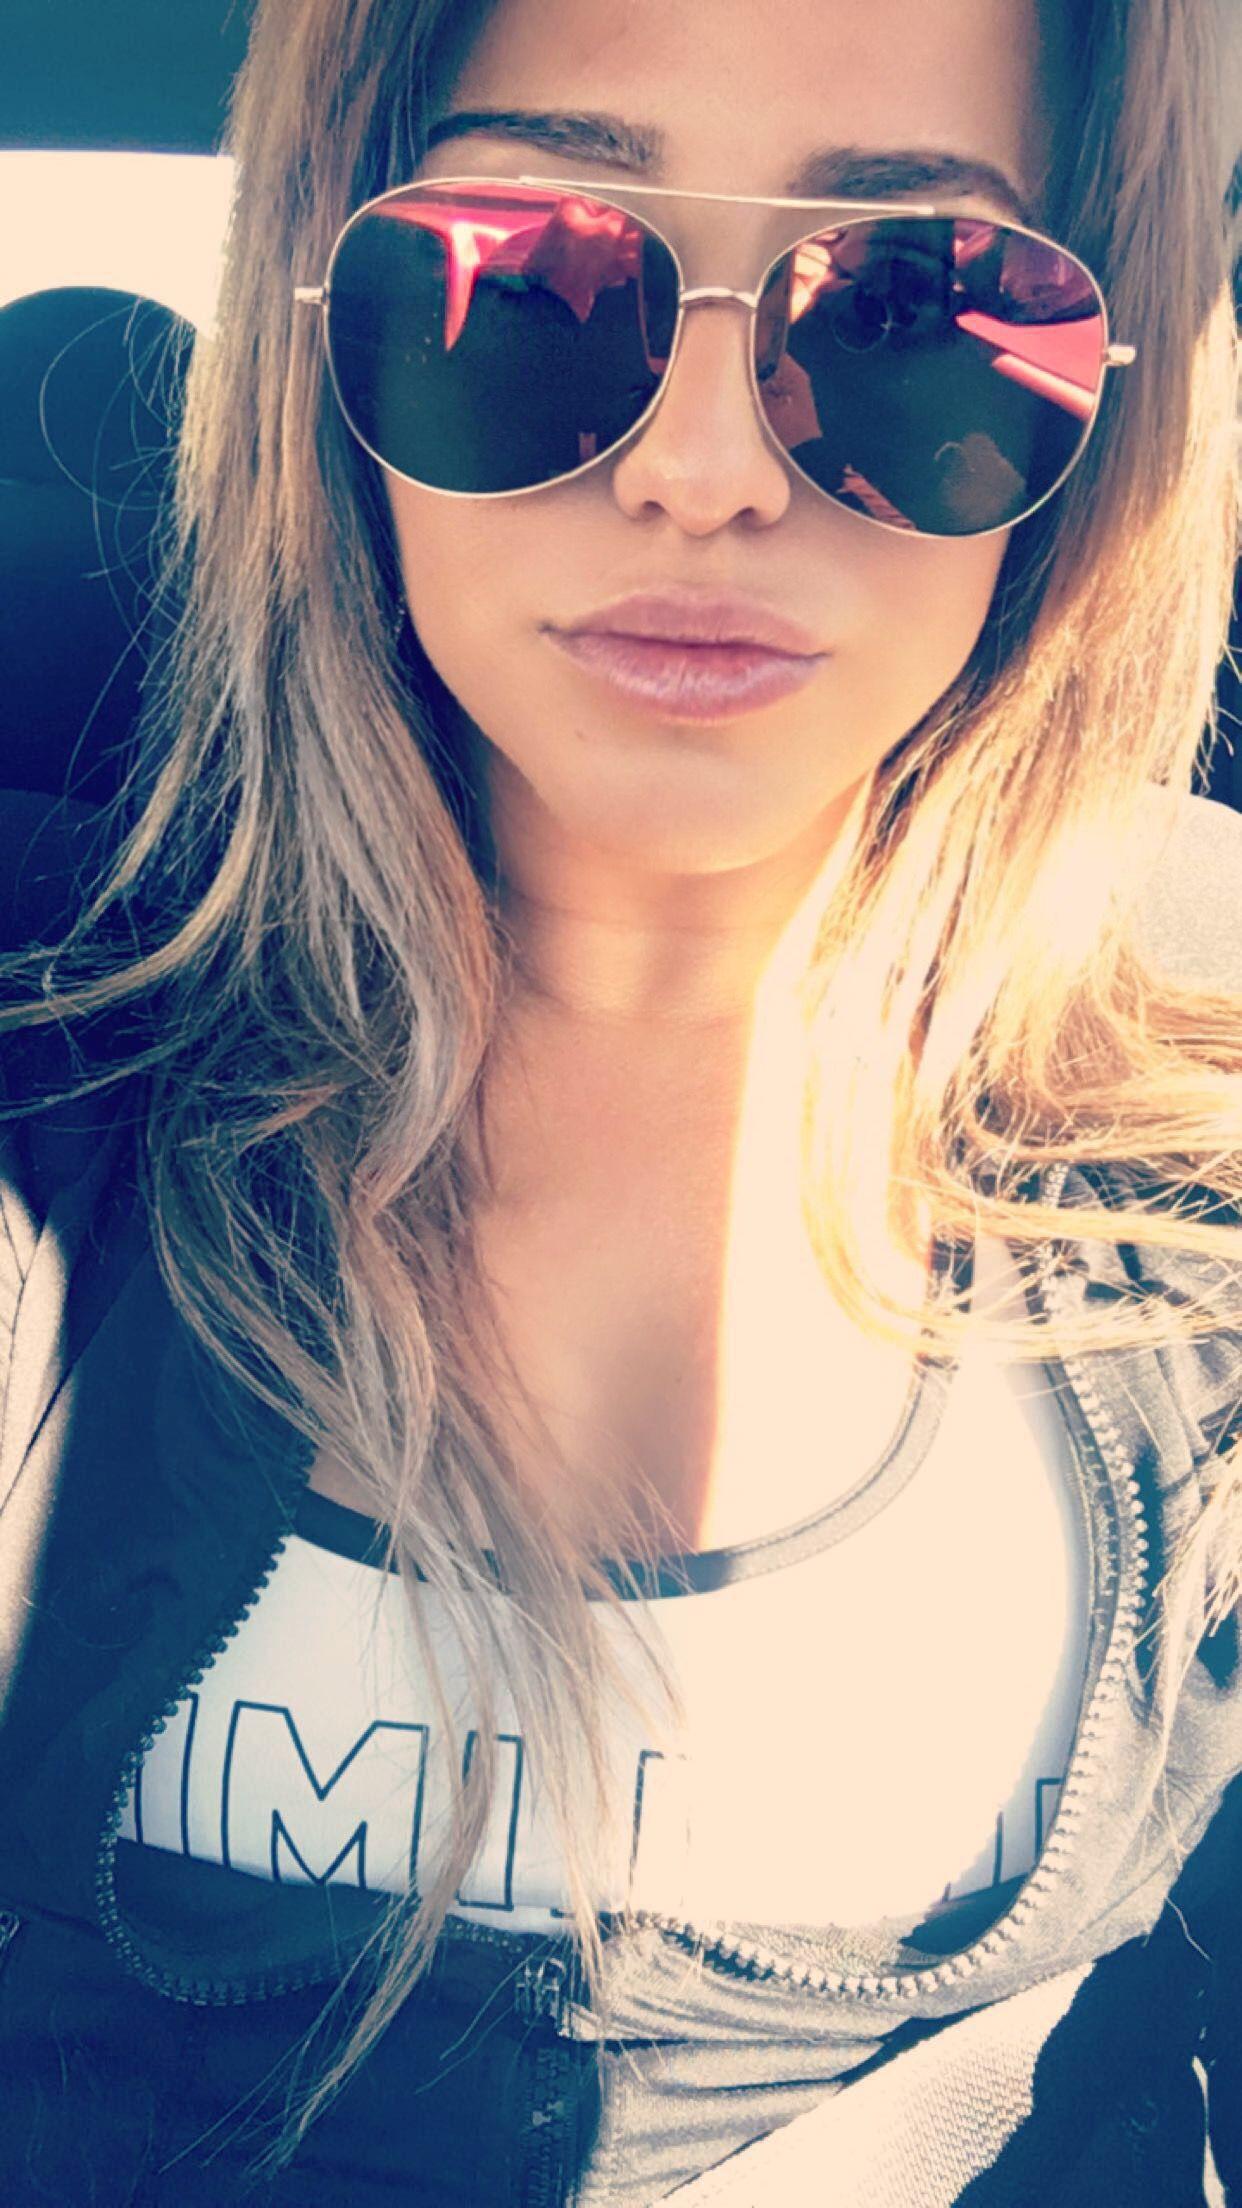 ff60d76c5925 Gata CA Carioca summer flash mirror sunglasses glasses fashion blue ...